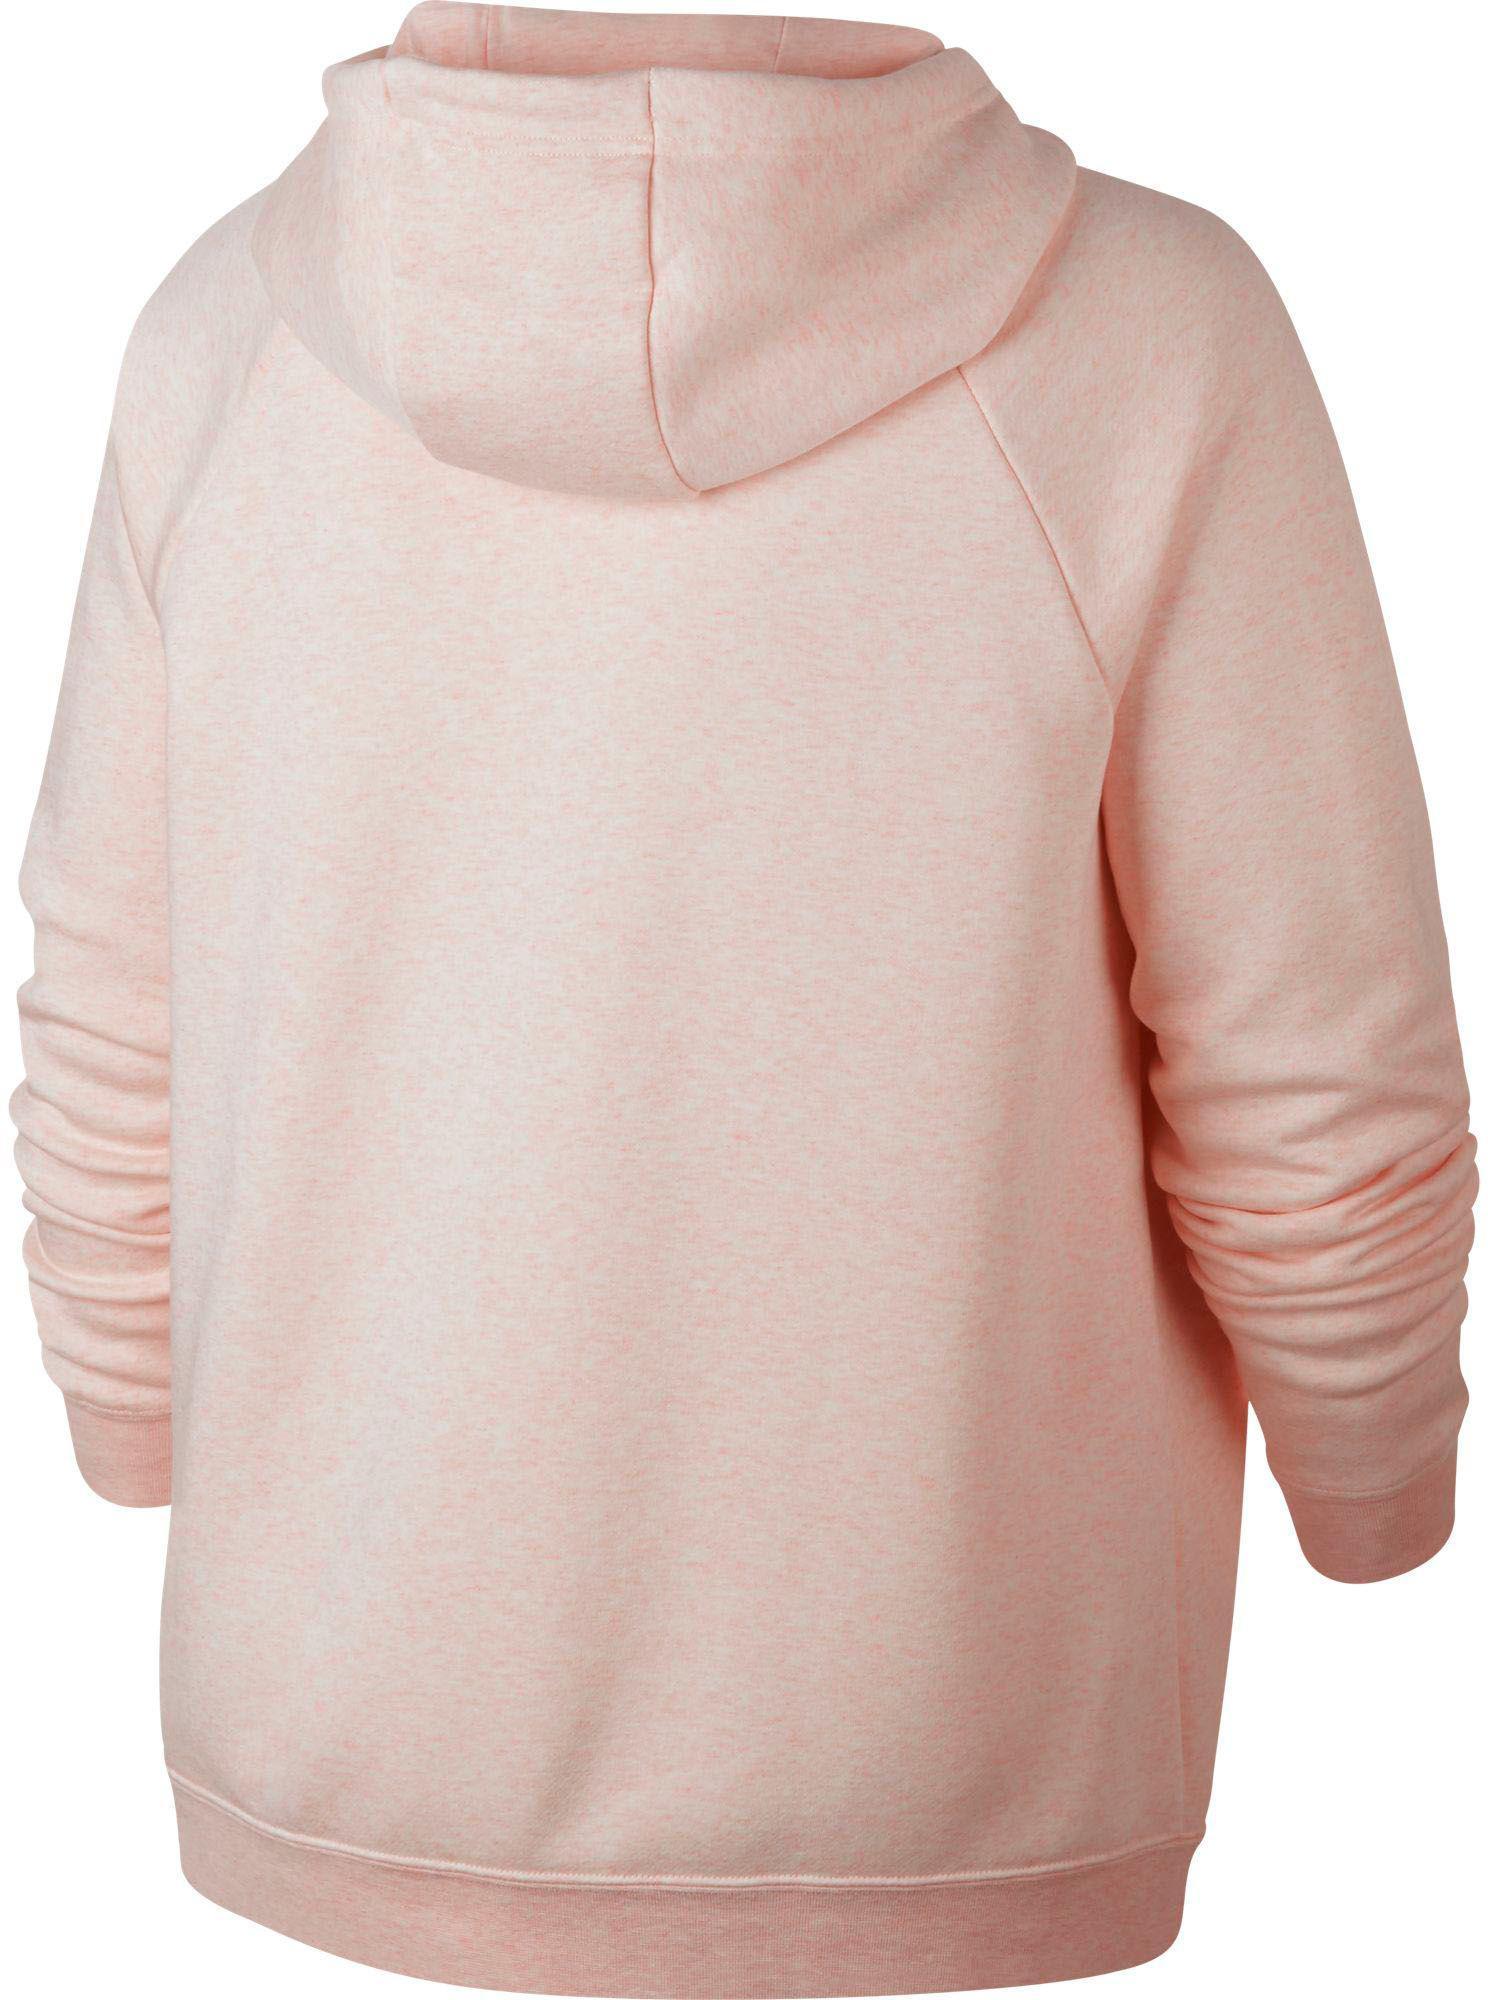 7155b2143e7d Nike - Pink Plus Size Sportswear Rally Hoodie - Lyst. View fullscreen